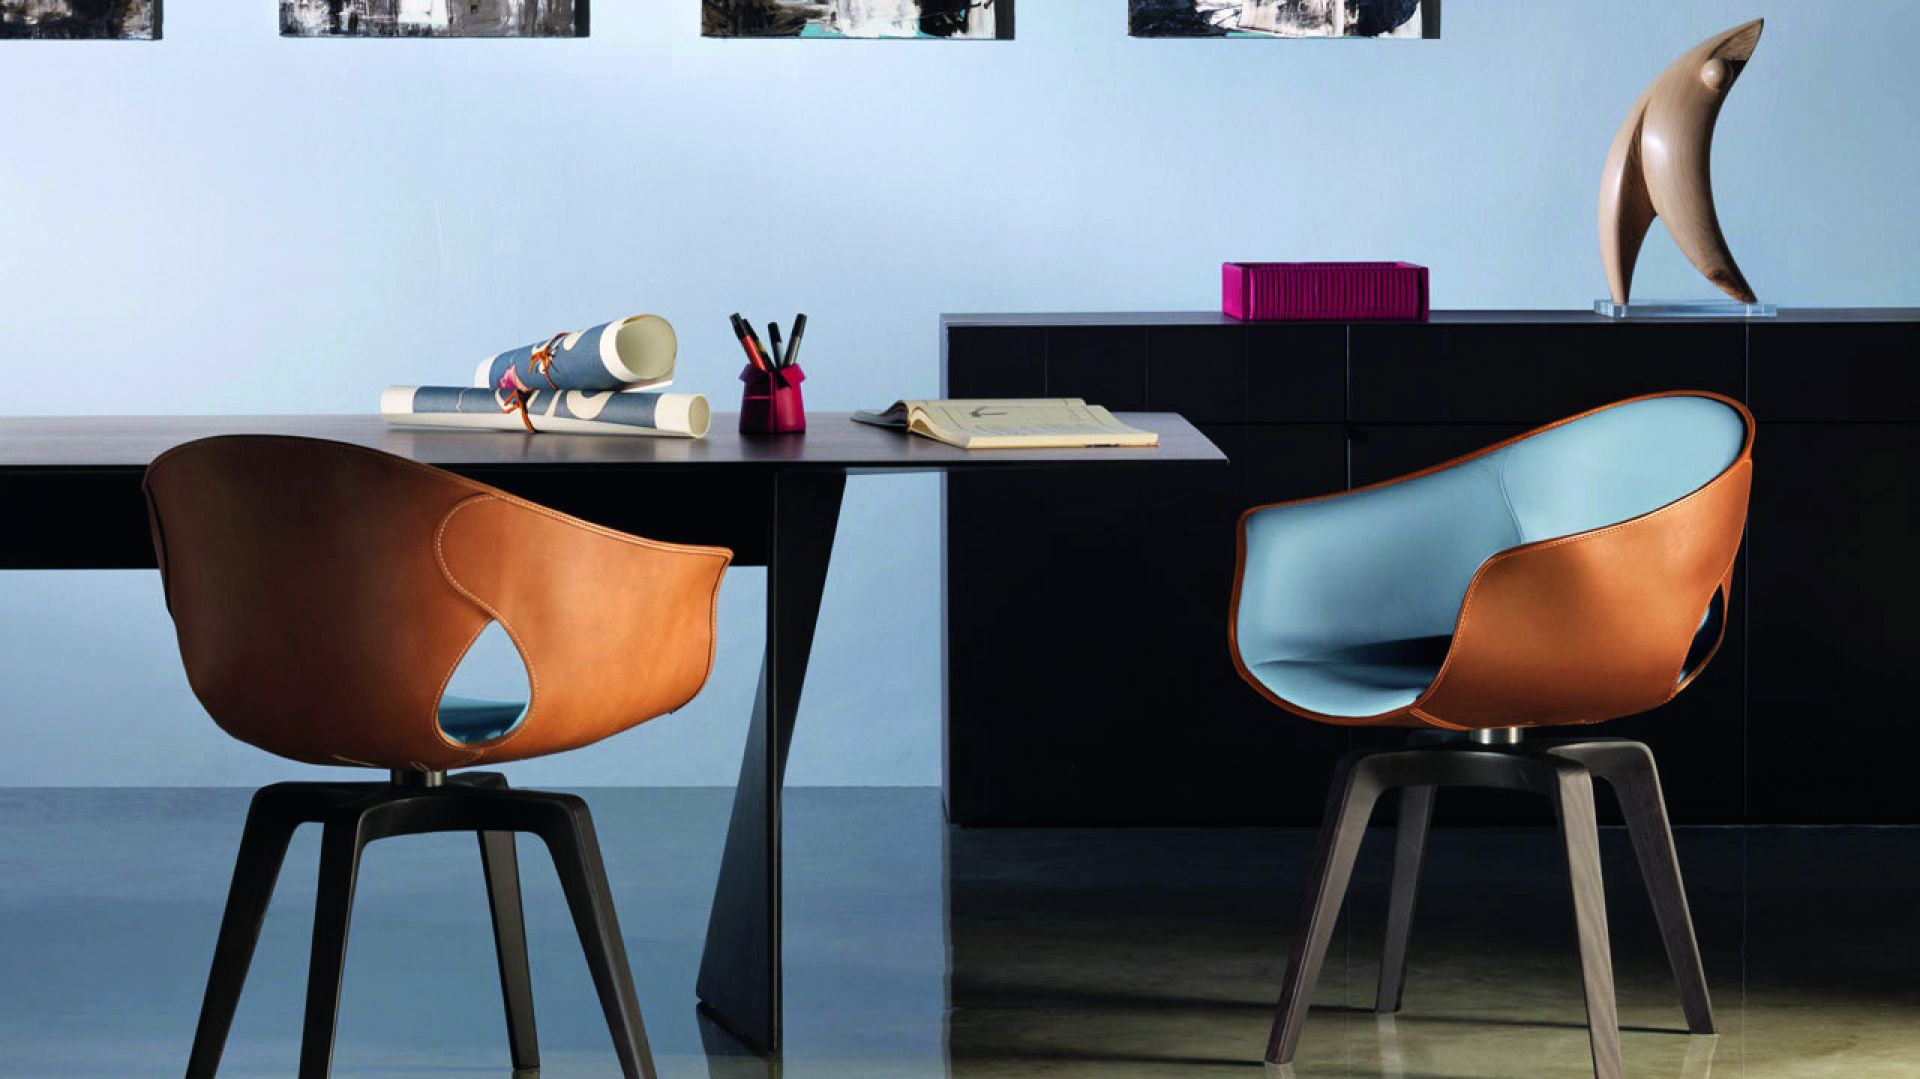 Krzesła z kolekcji Ginger. Fot. Poltrona Frau